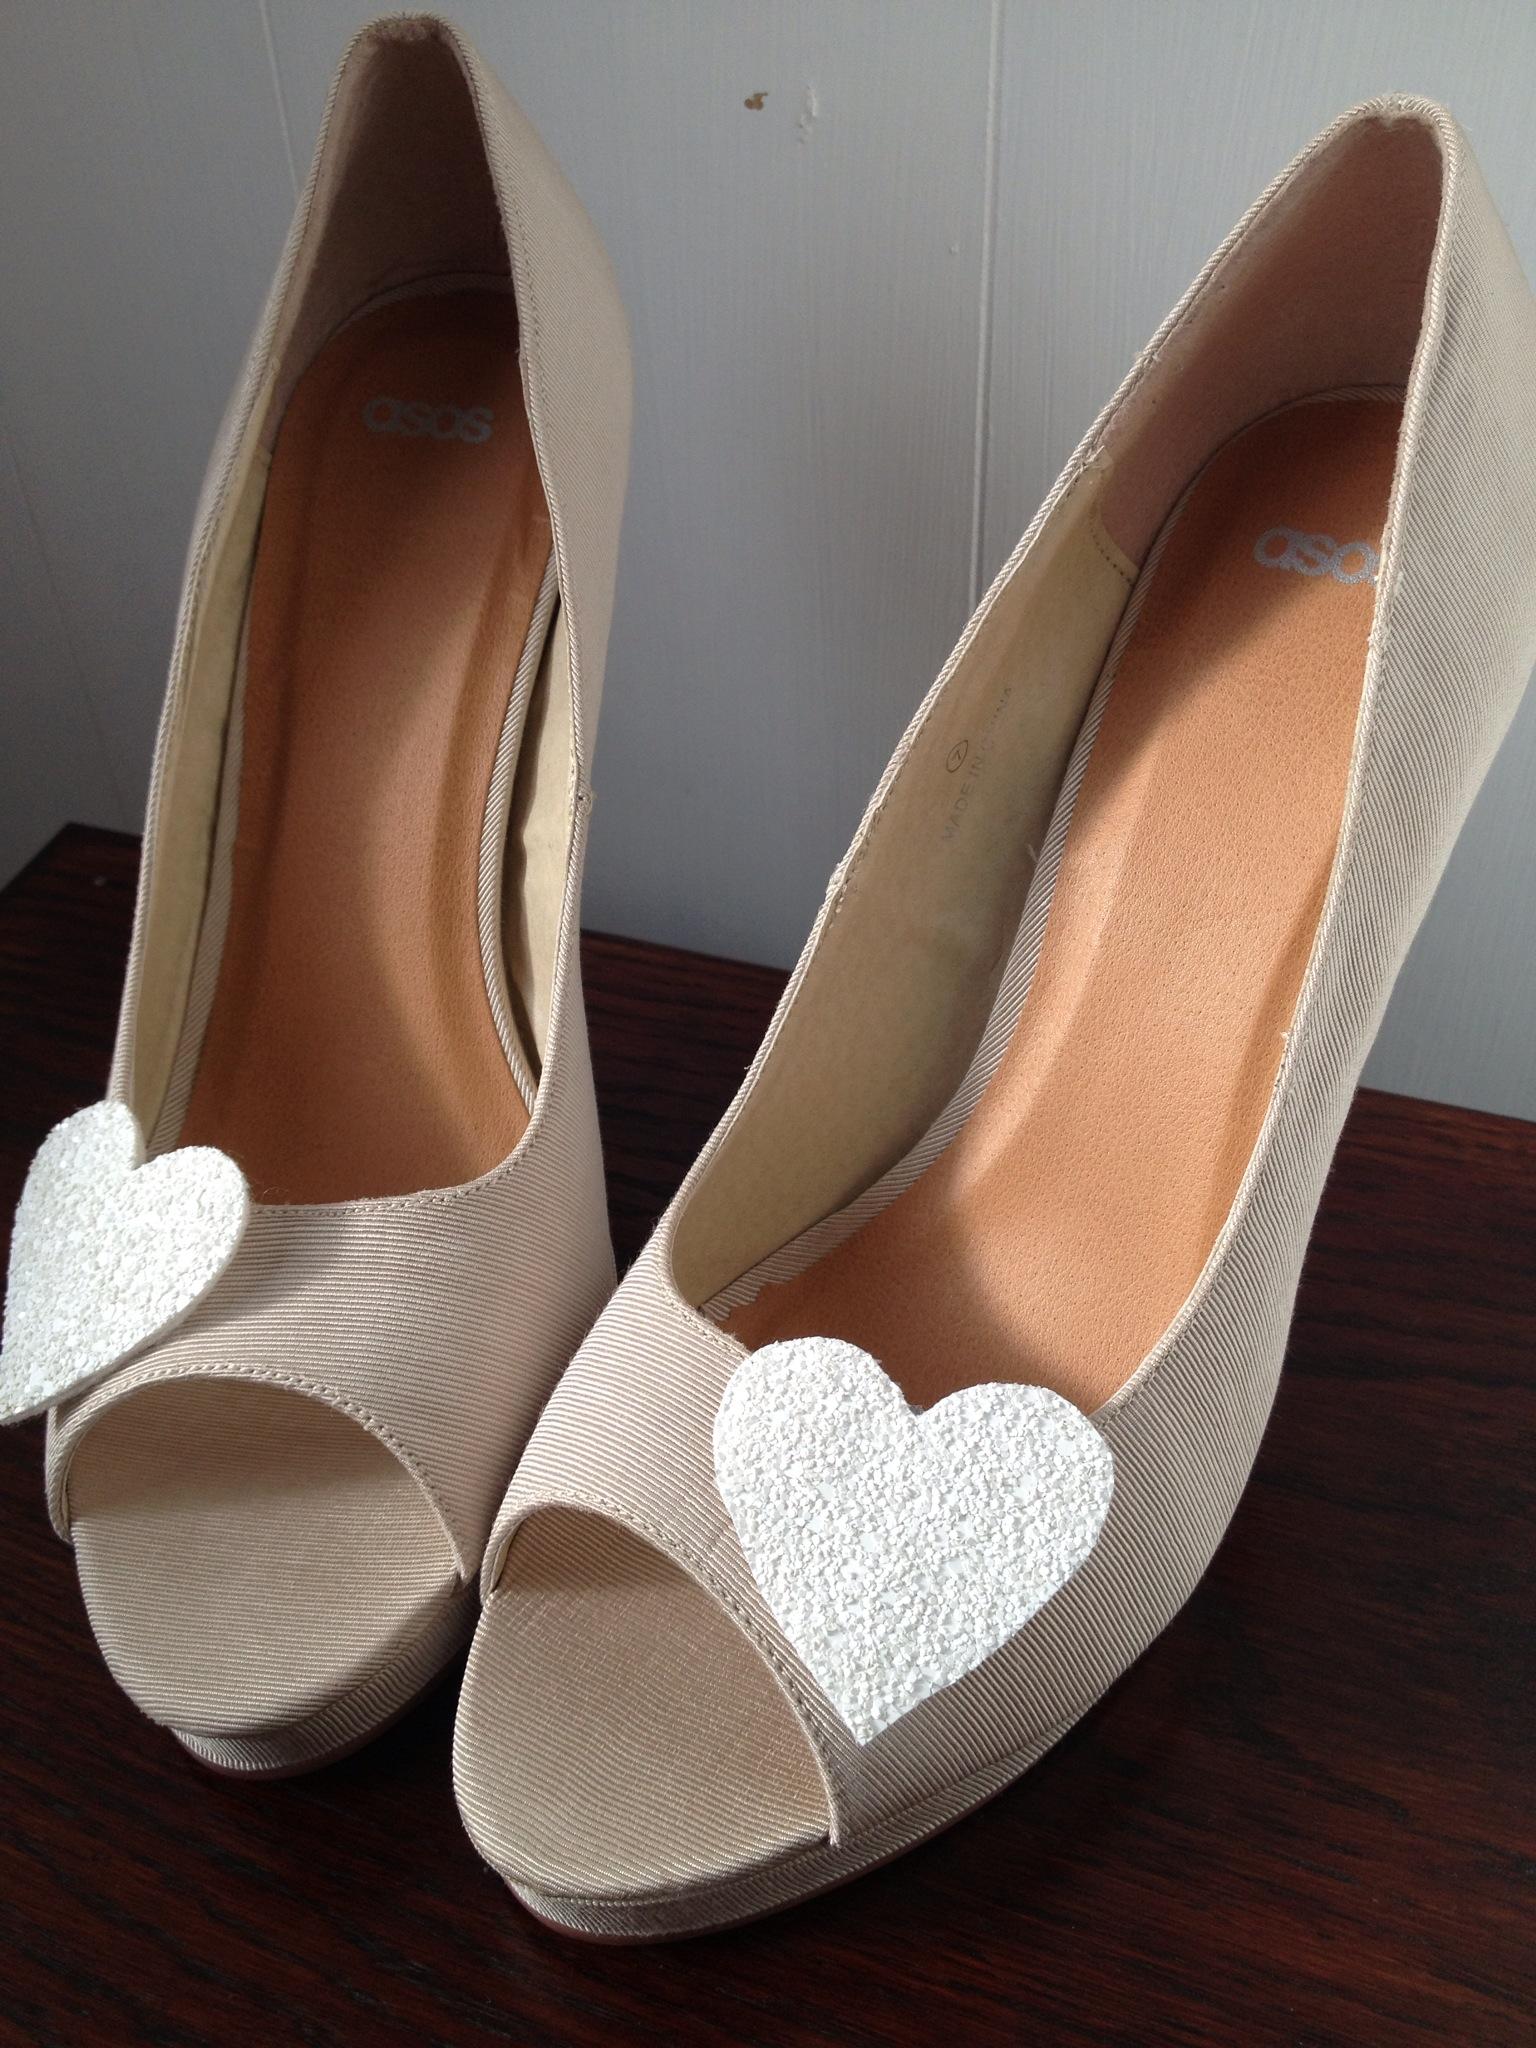 retro bridal shoes photo - 1